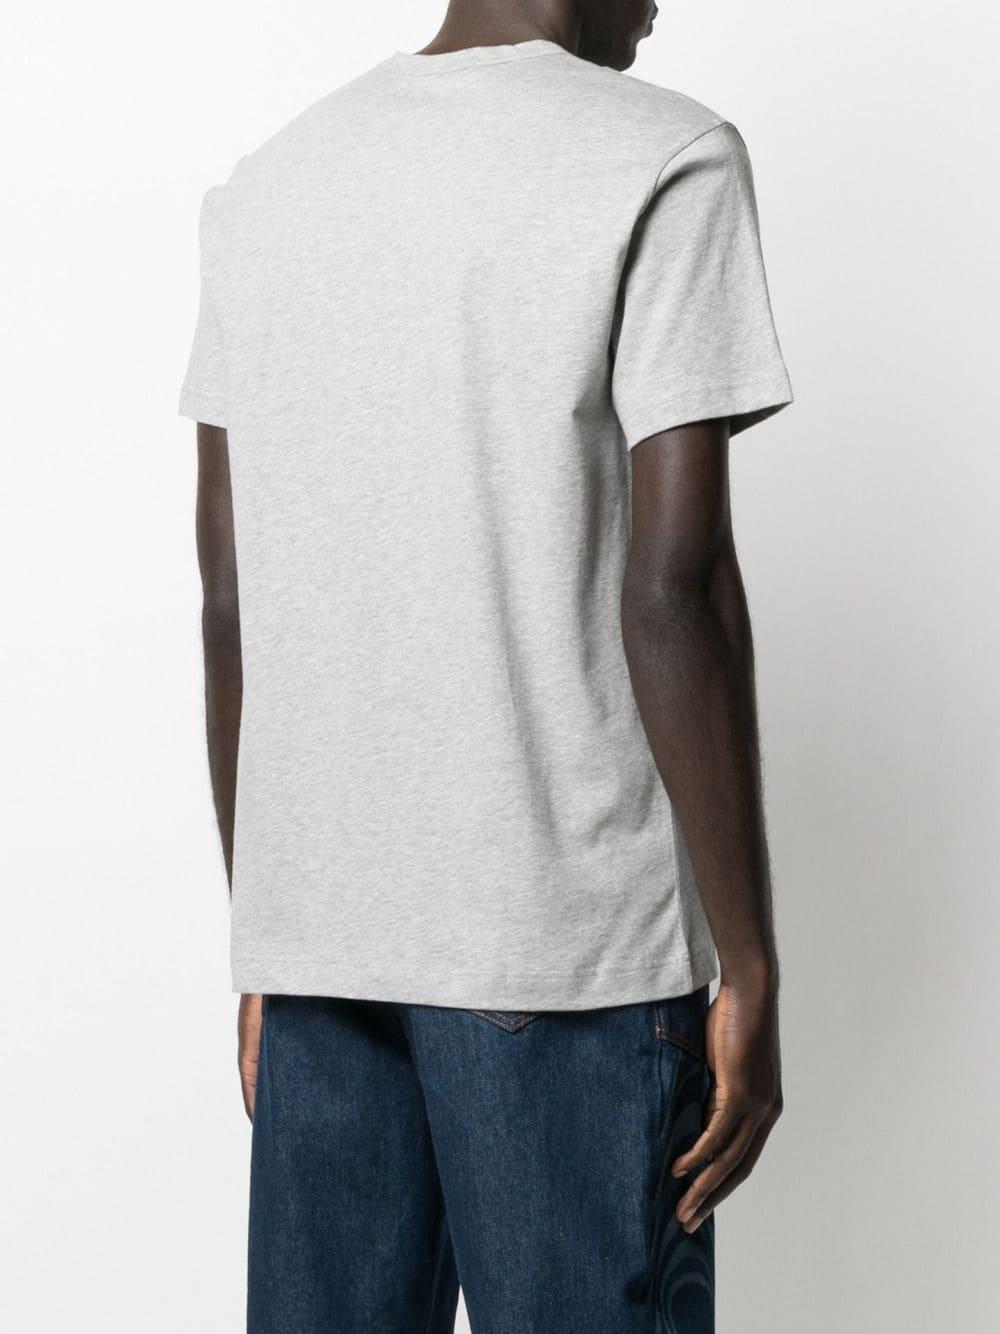 COMME DES GARÇONS SHIRT | T-shirts | FG-T018GREY